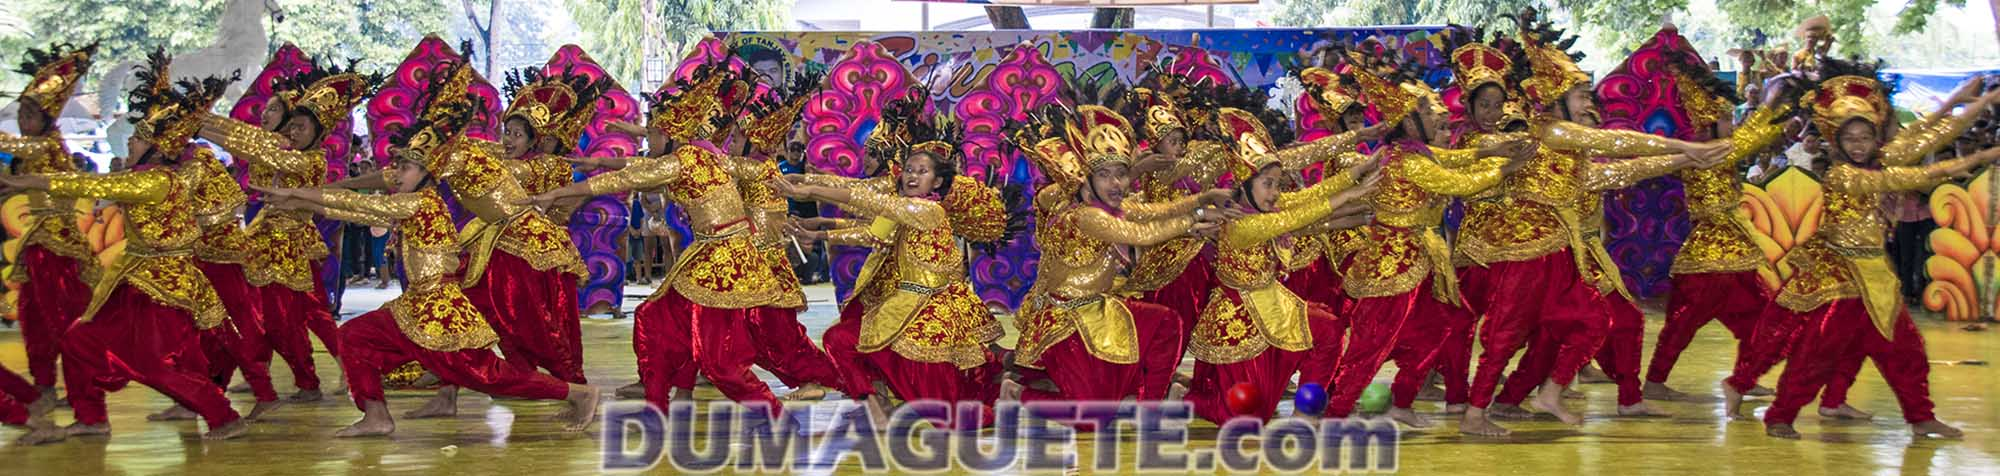 Sinulog sa Tanjay Festival 2018 - Negros Oriental